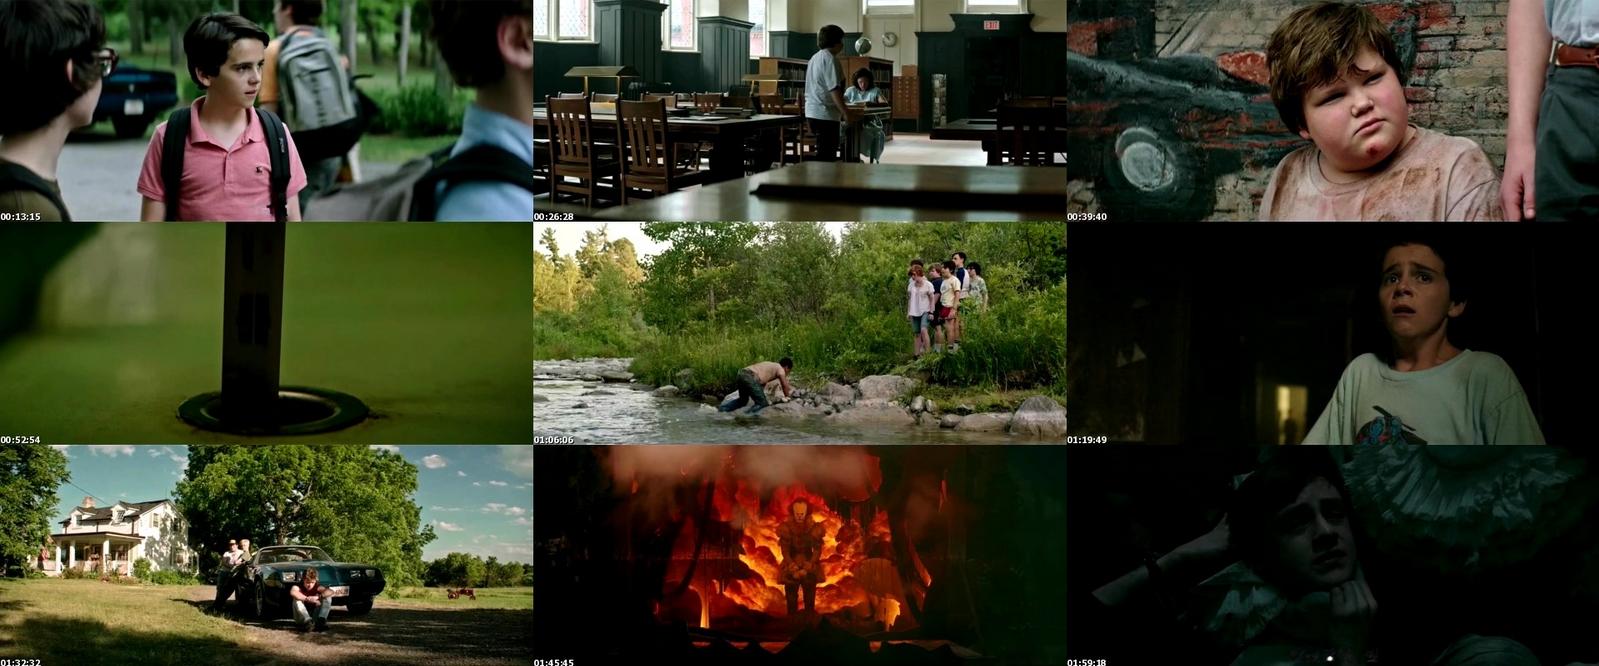 Download Film It (2017) HDRip 720p x265 1080p 720p